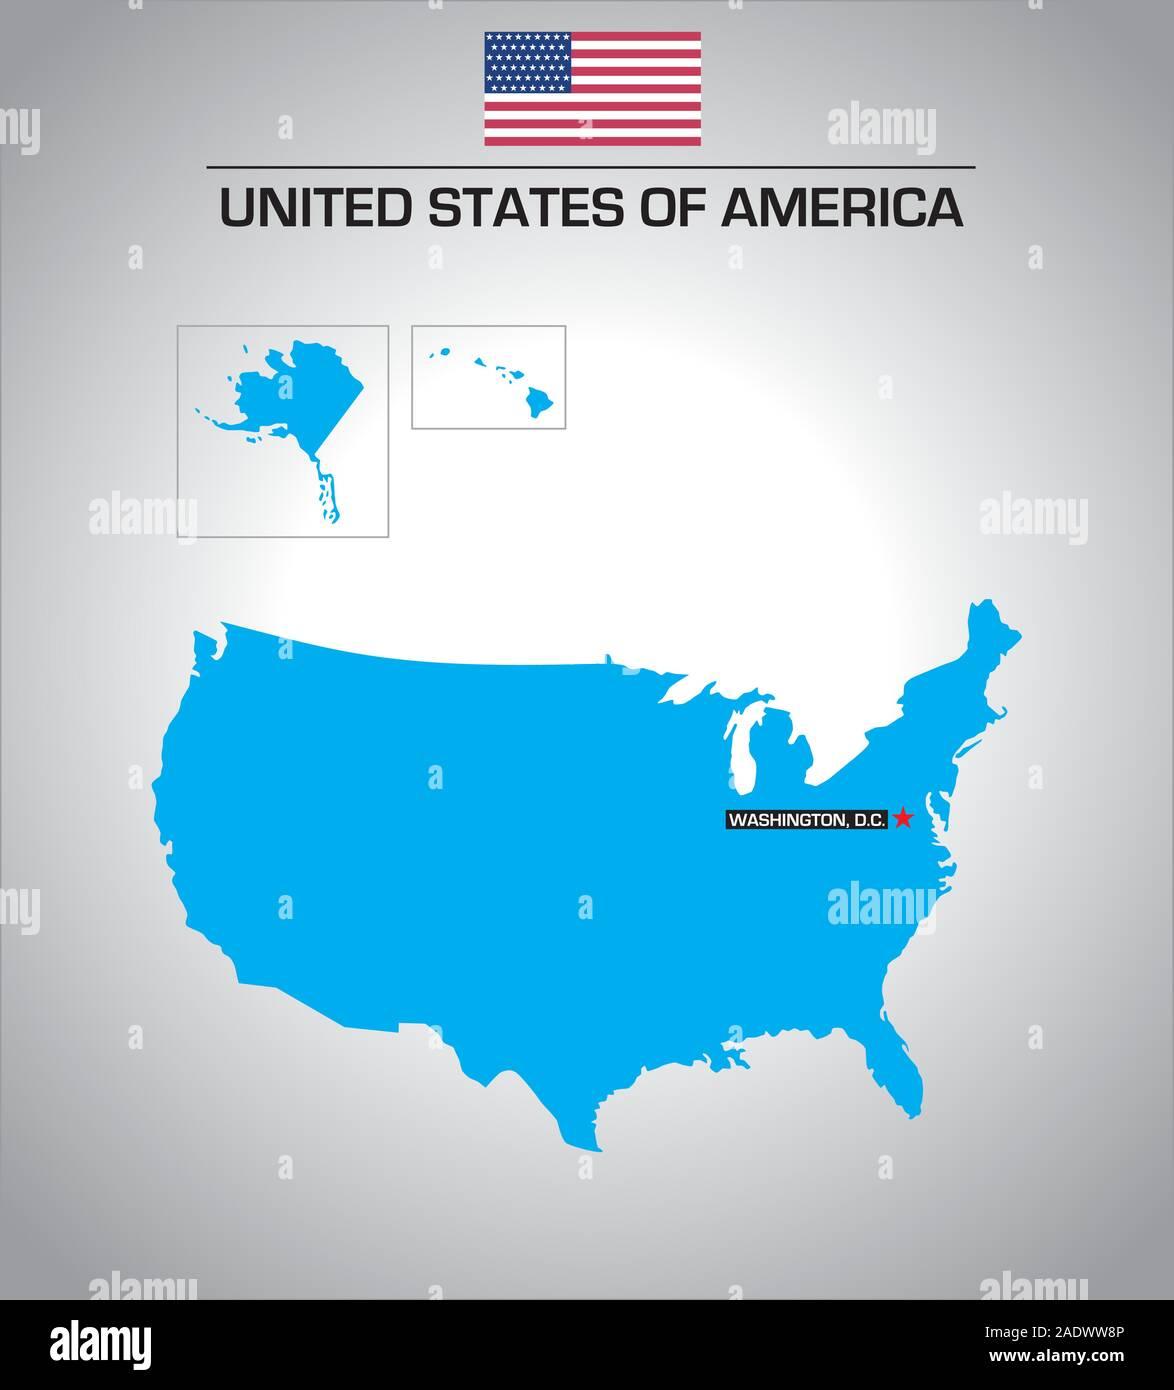 United States Map Alaska And Hawaii Stock Photos & United ...